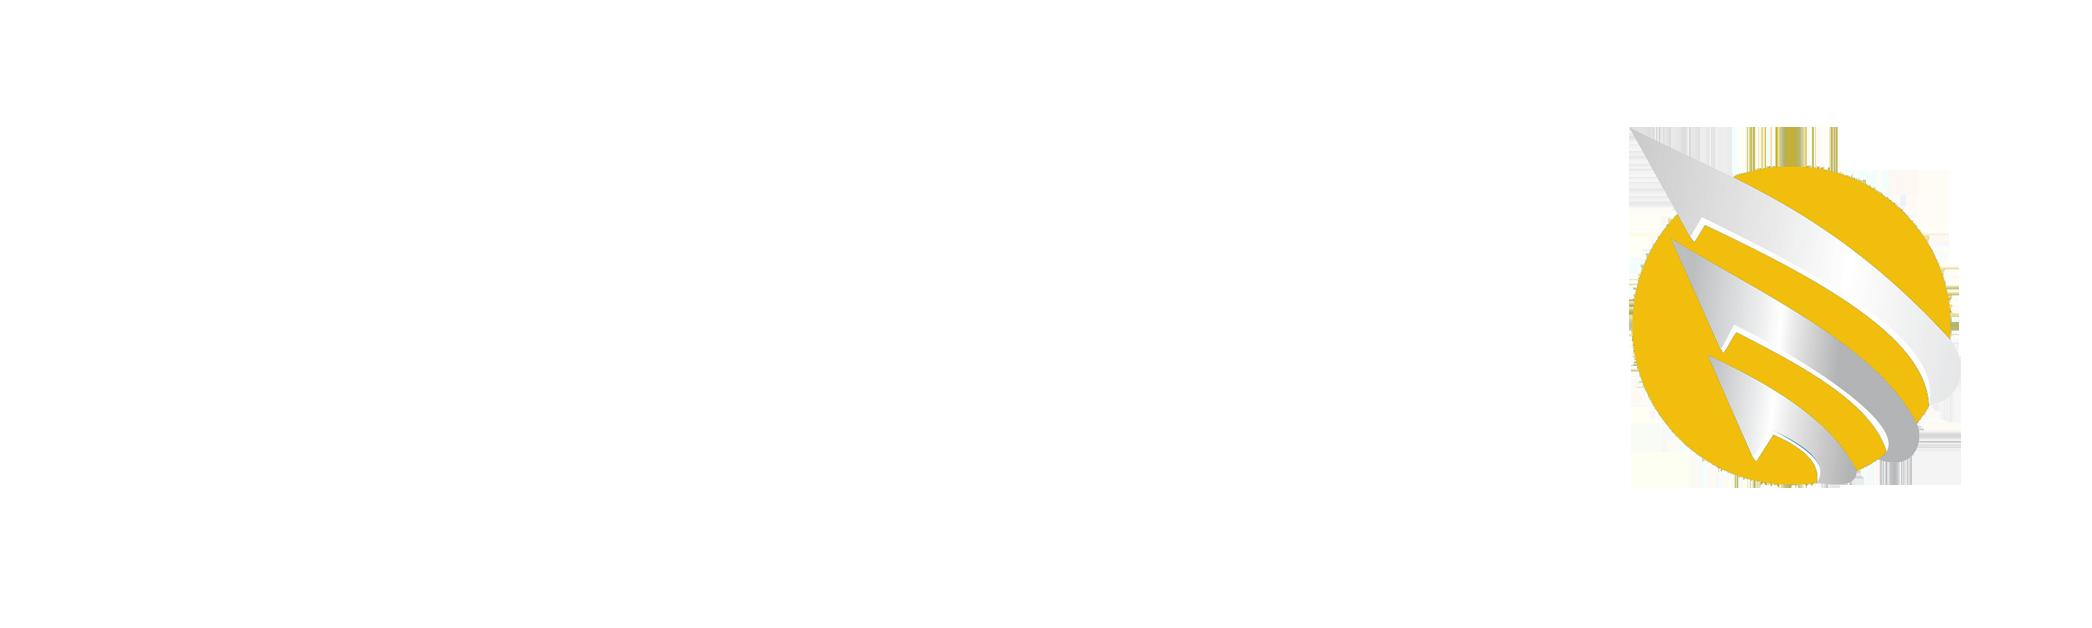 پایگاه خبری پیام خاوران